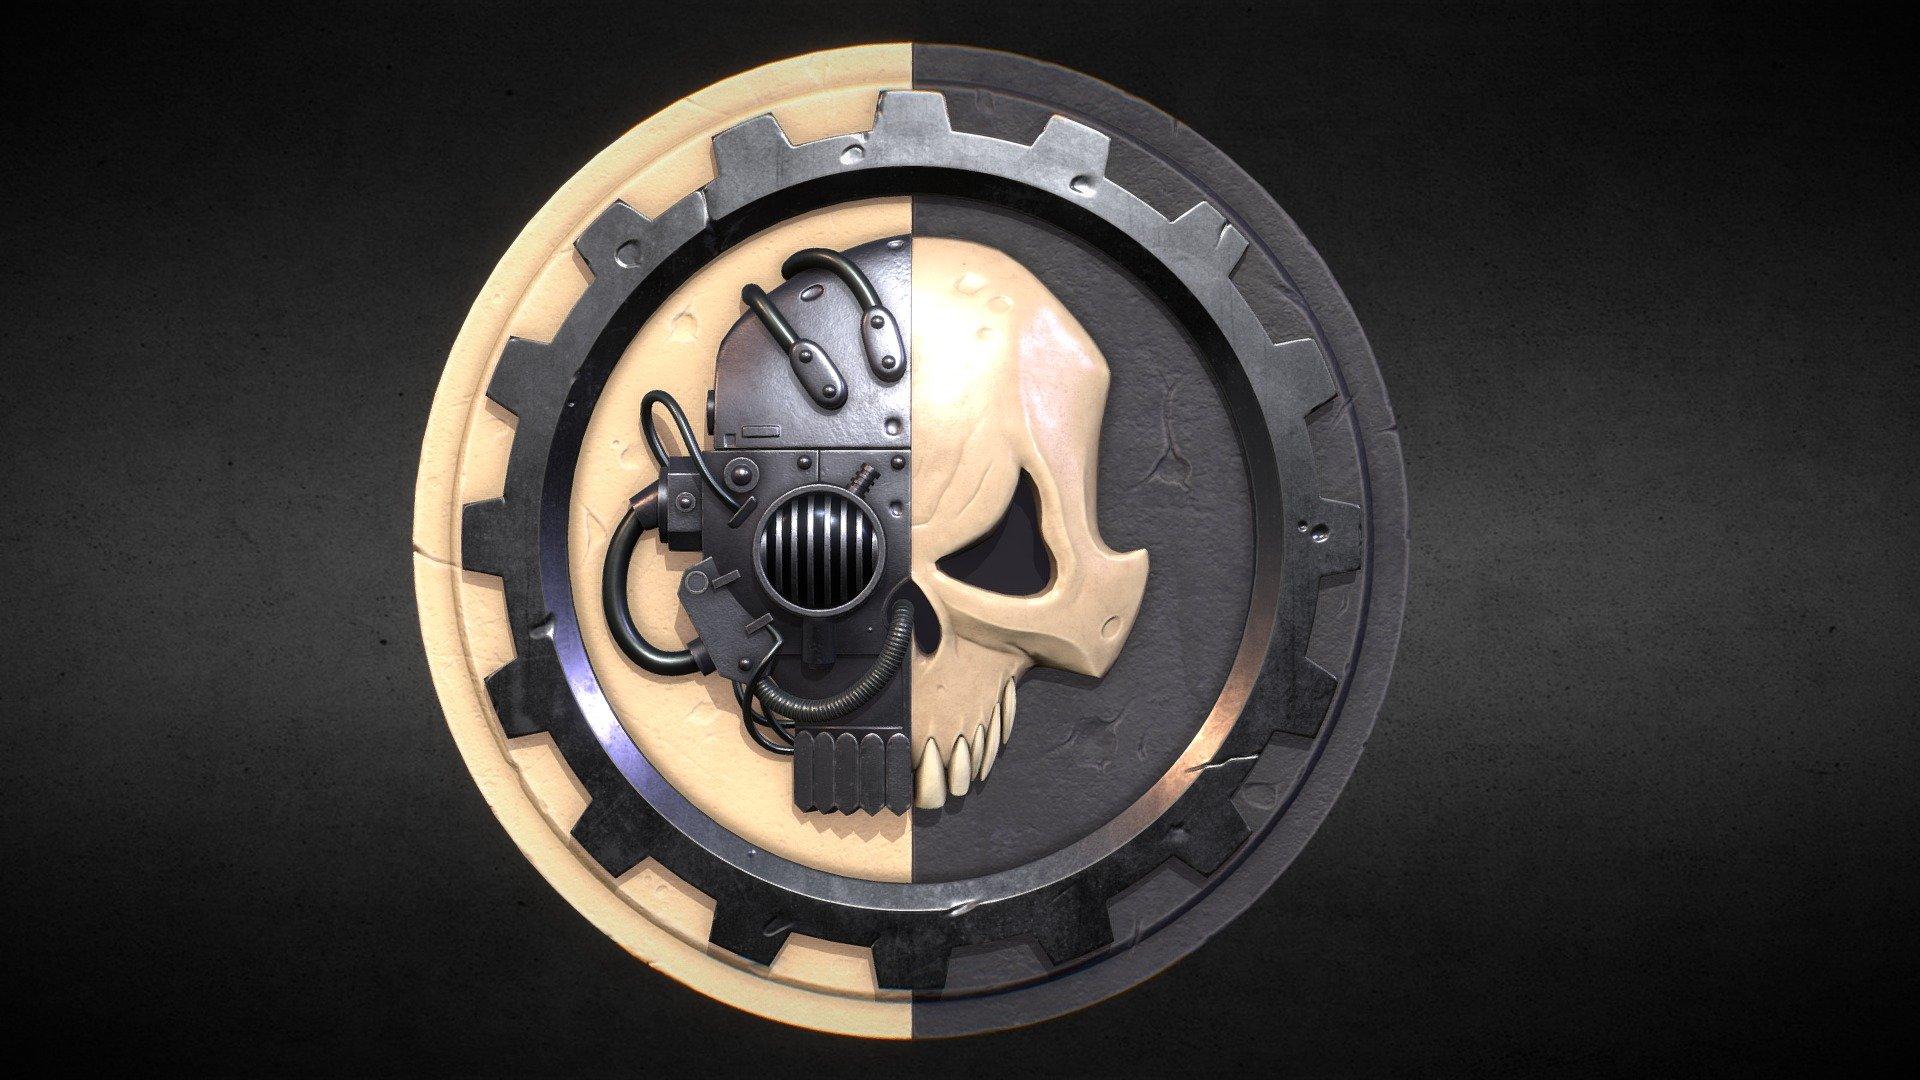 Adeptus Mechanicus Symbol Download Free 3d Model By Drbanana